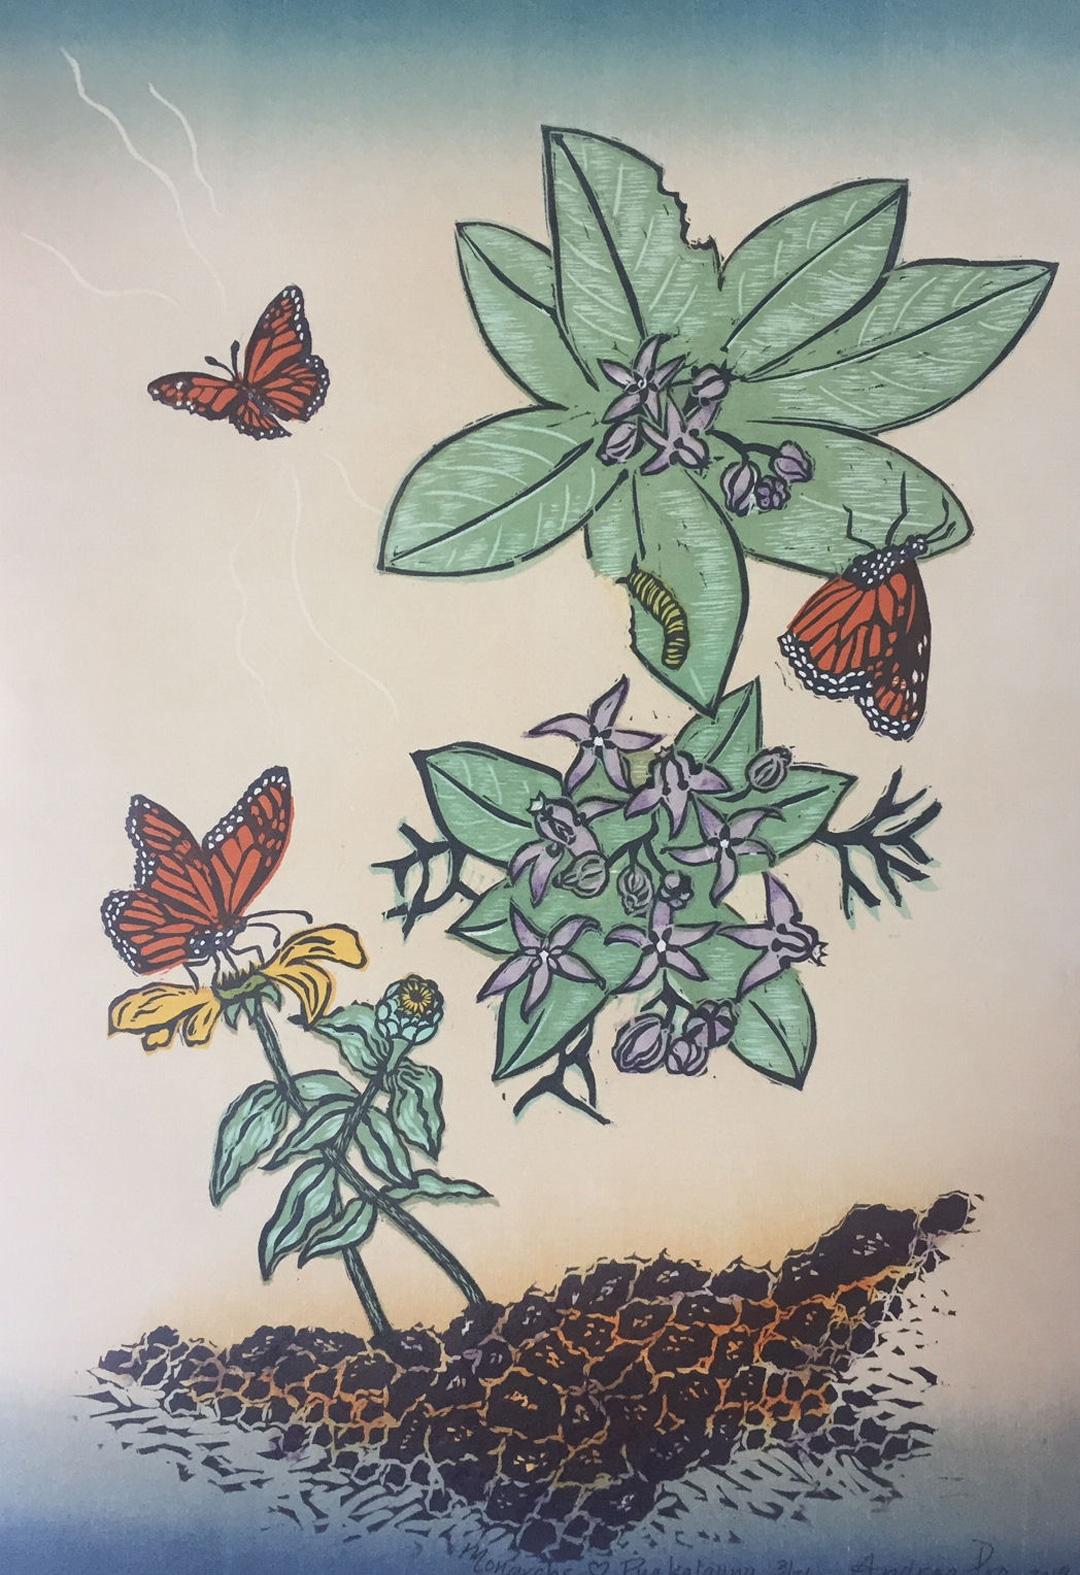 Monarchs Love Pua Kalaunu painting of Monarch butterflies and Pua Kalaunu